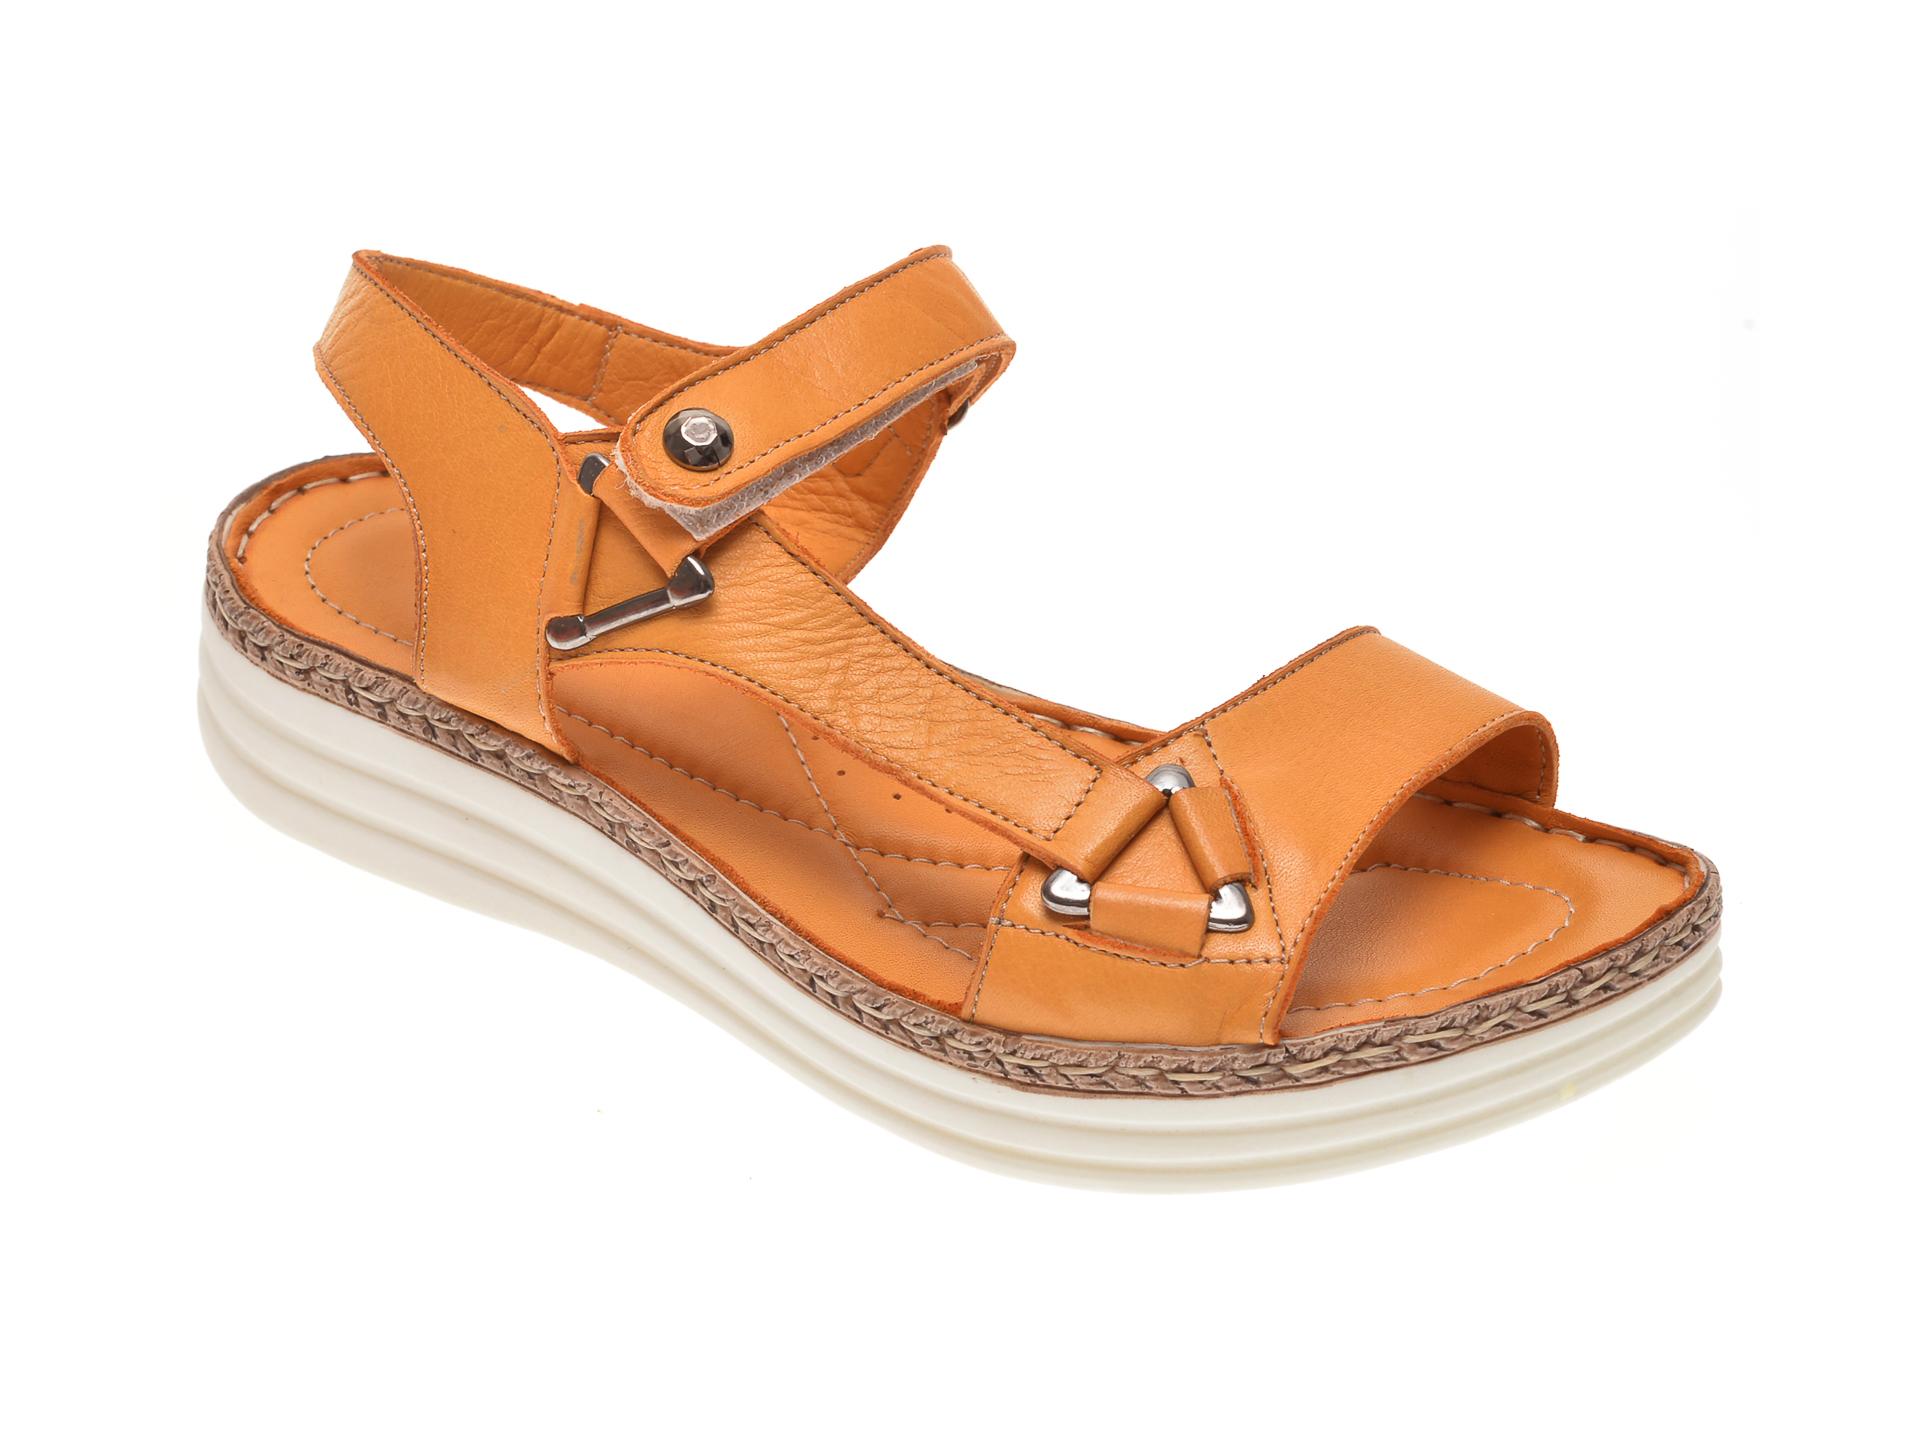 Sandale X TREND galbene, 513, din piele naturala